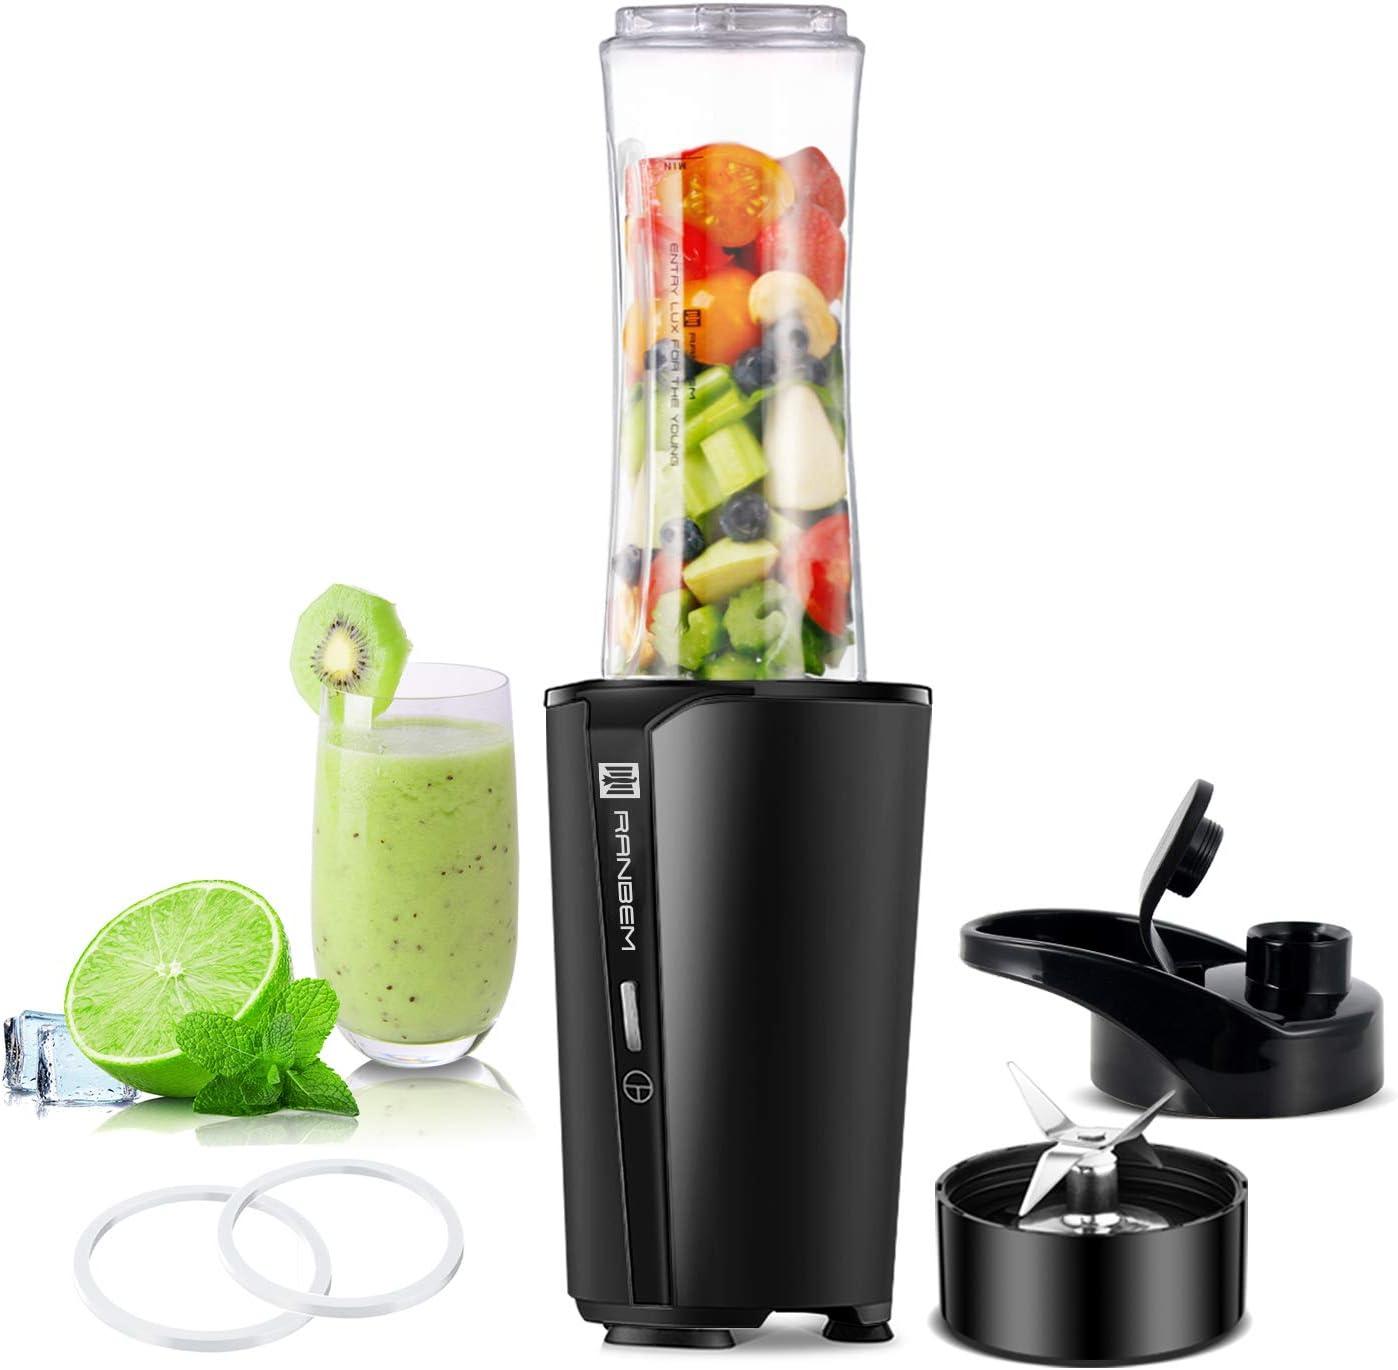 Bullet Blender, Smoothies Blender for Kitchen & Personal Single Serve Blender for Shake, Fruit Juice Mixer with 600ml Portable Travel Bottle, 300W